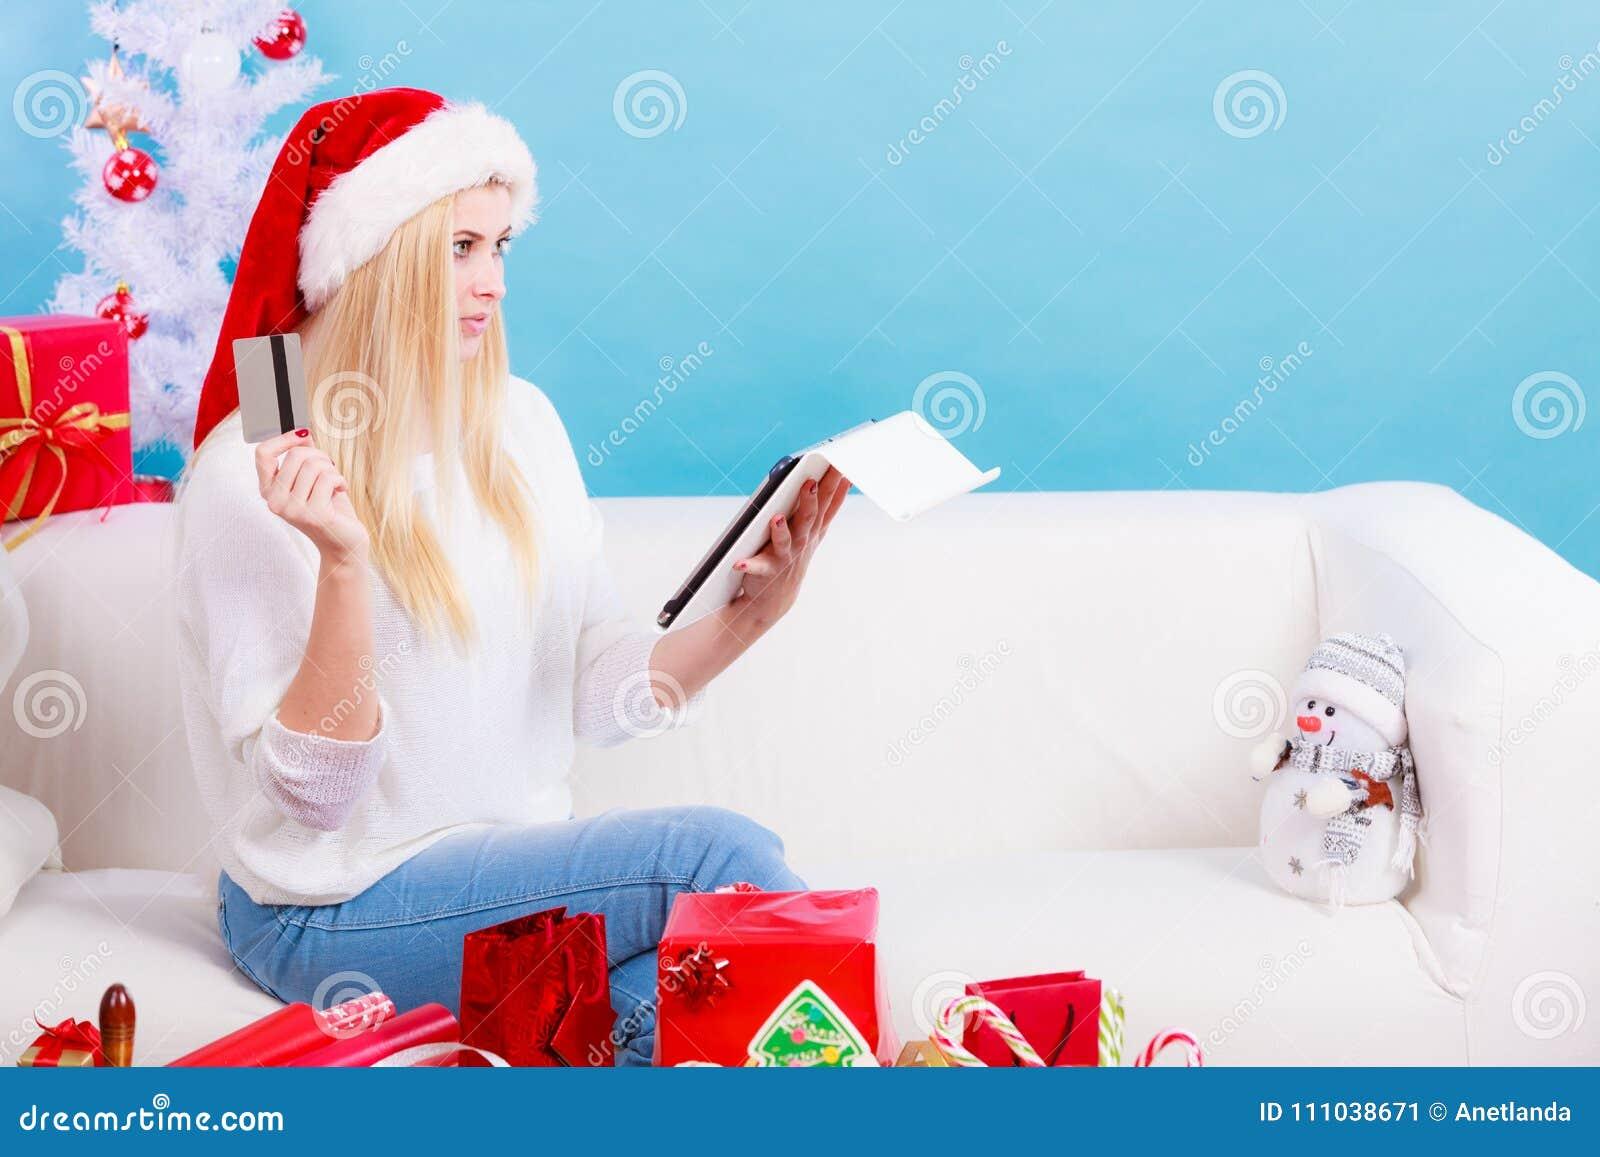 Woman Buying Christmas Gifts Online Stock Image - Image of customer ...